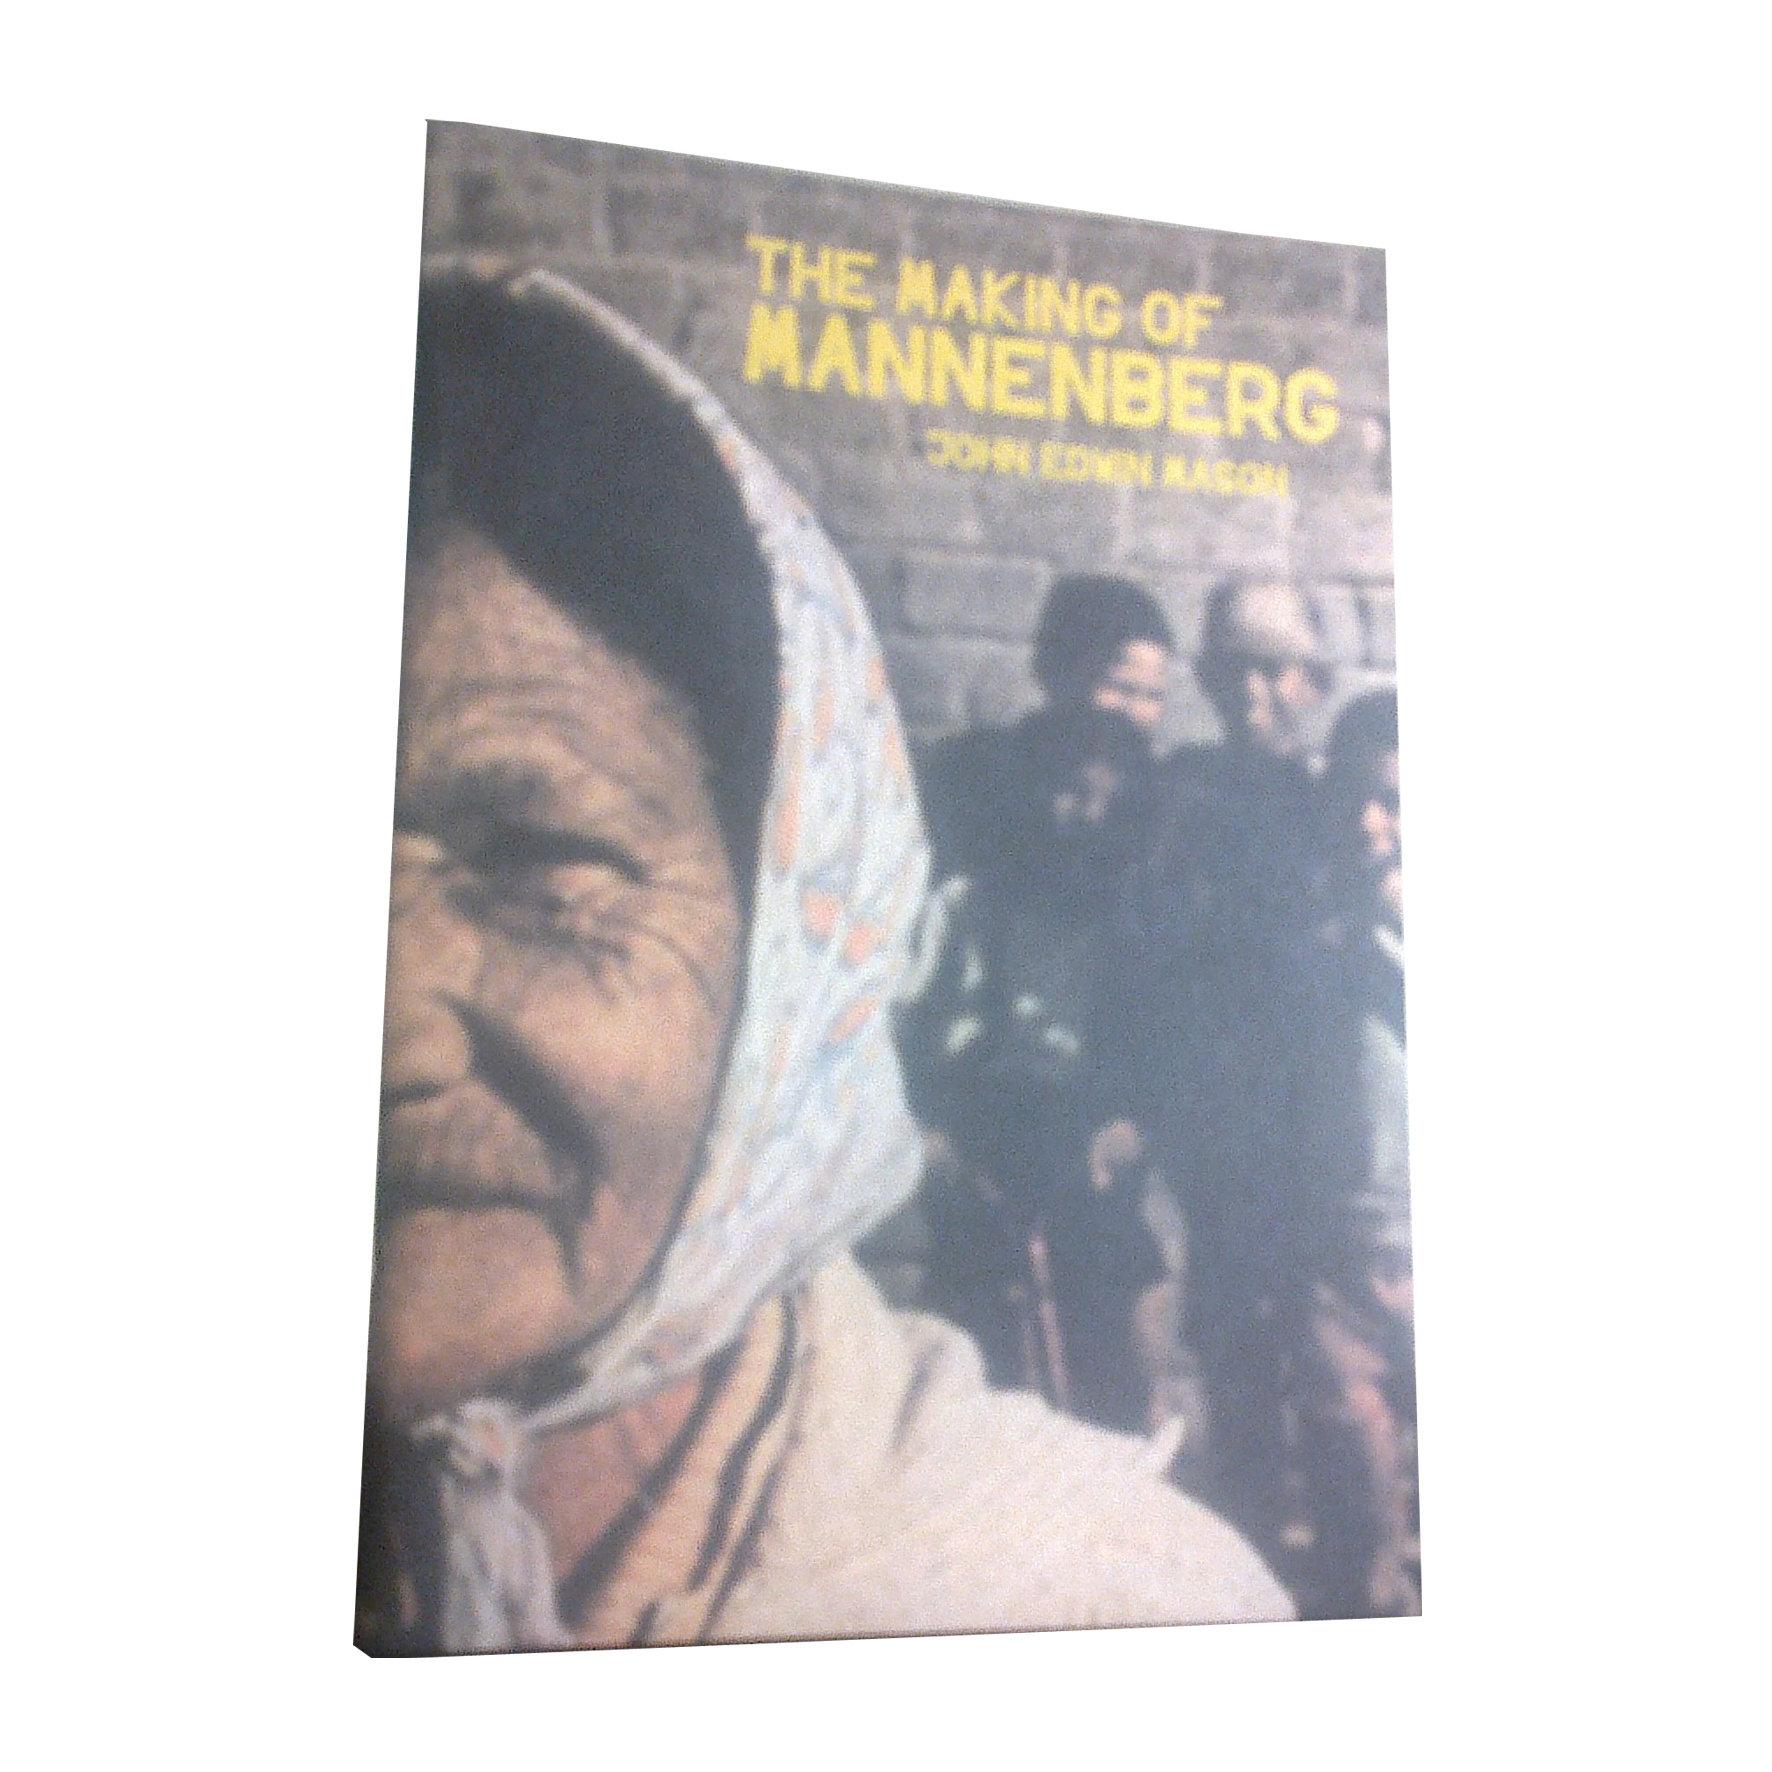 Chimurenganyana Series 2: The Making of Manenburg by John Edwin Mason (June 2012) CN01